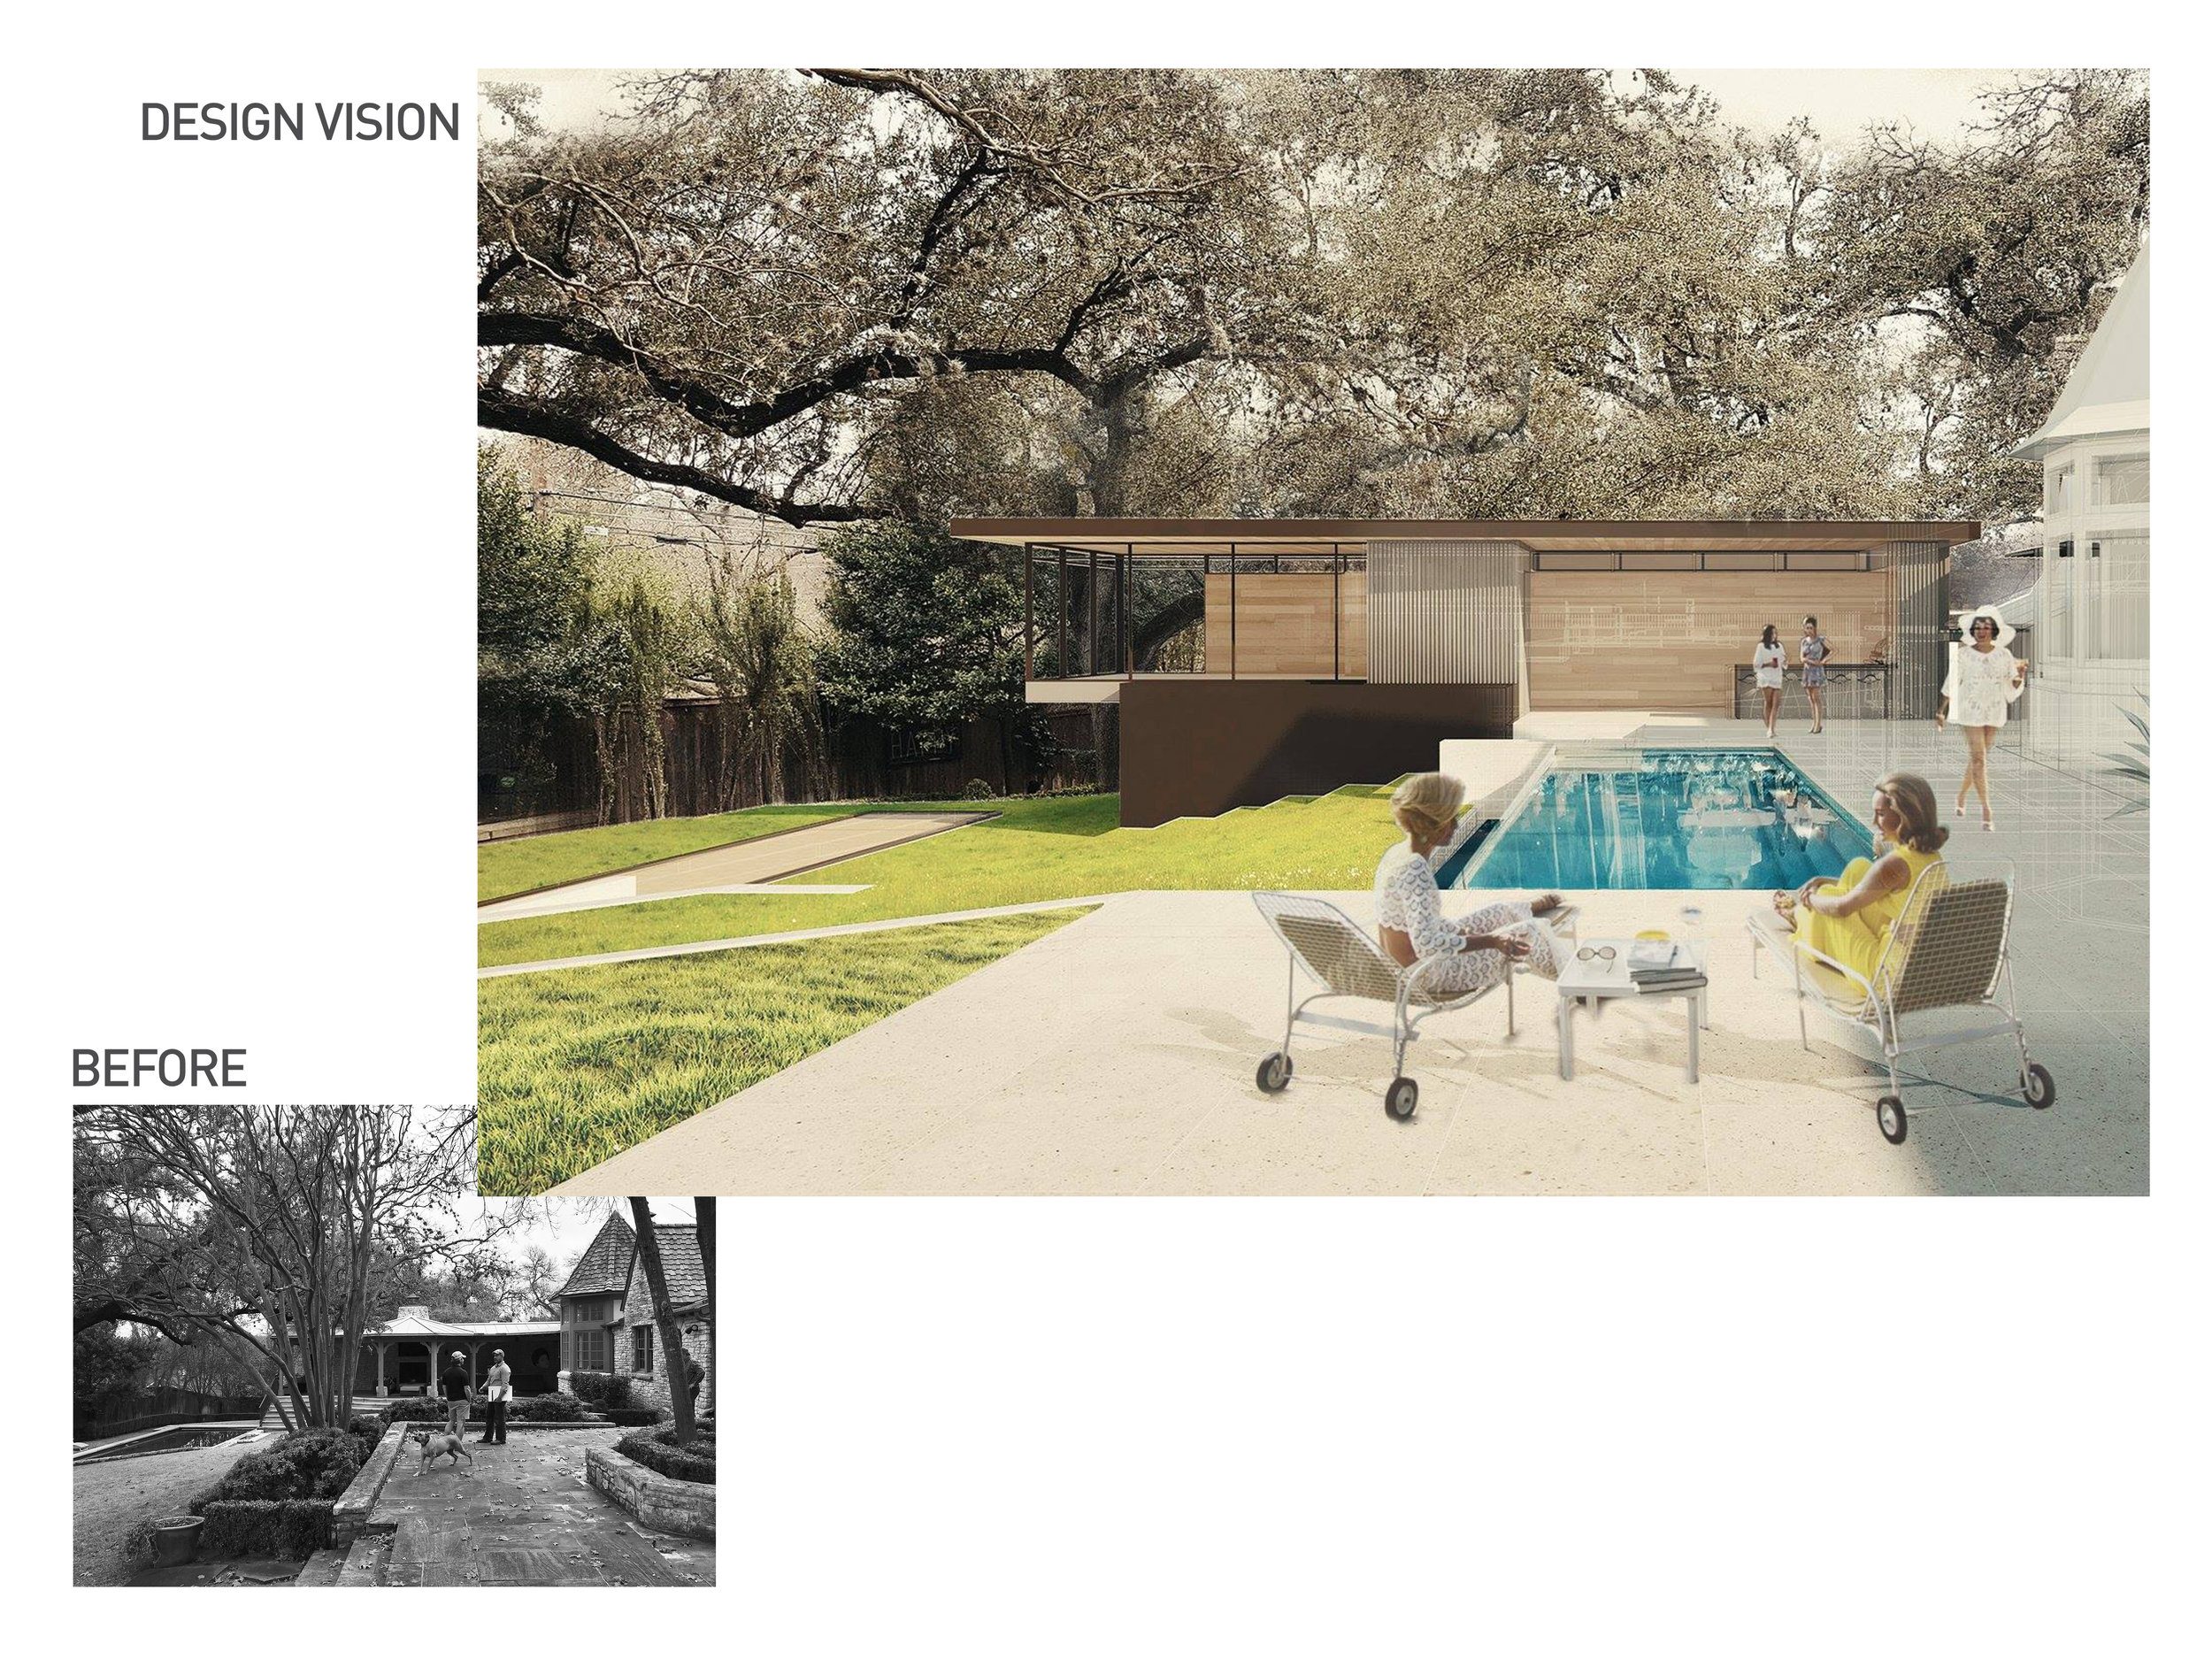 Slim House by Matt Fajkus Architecture. Before+Design.jpg